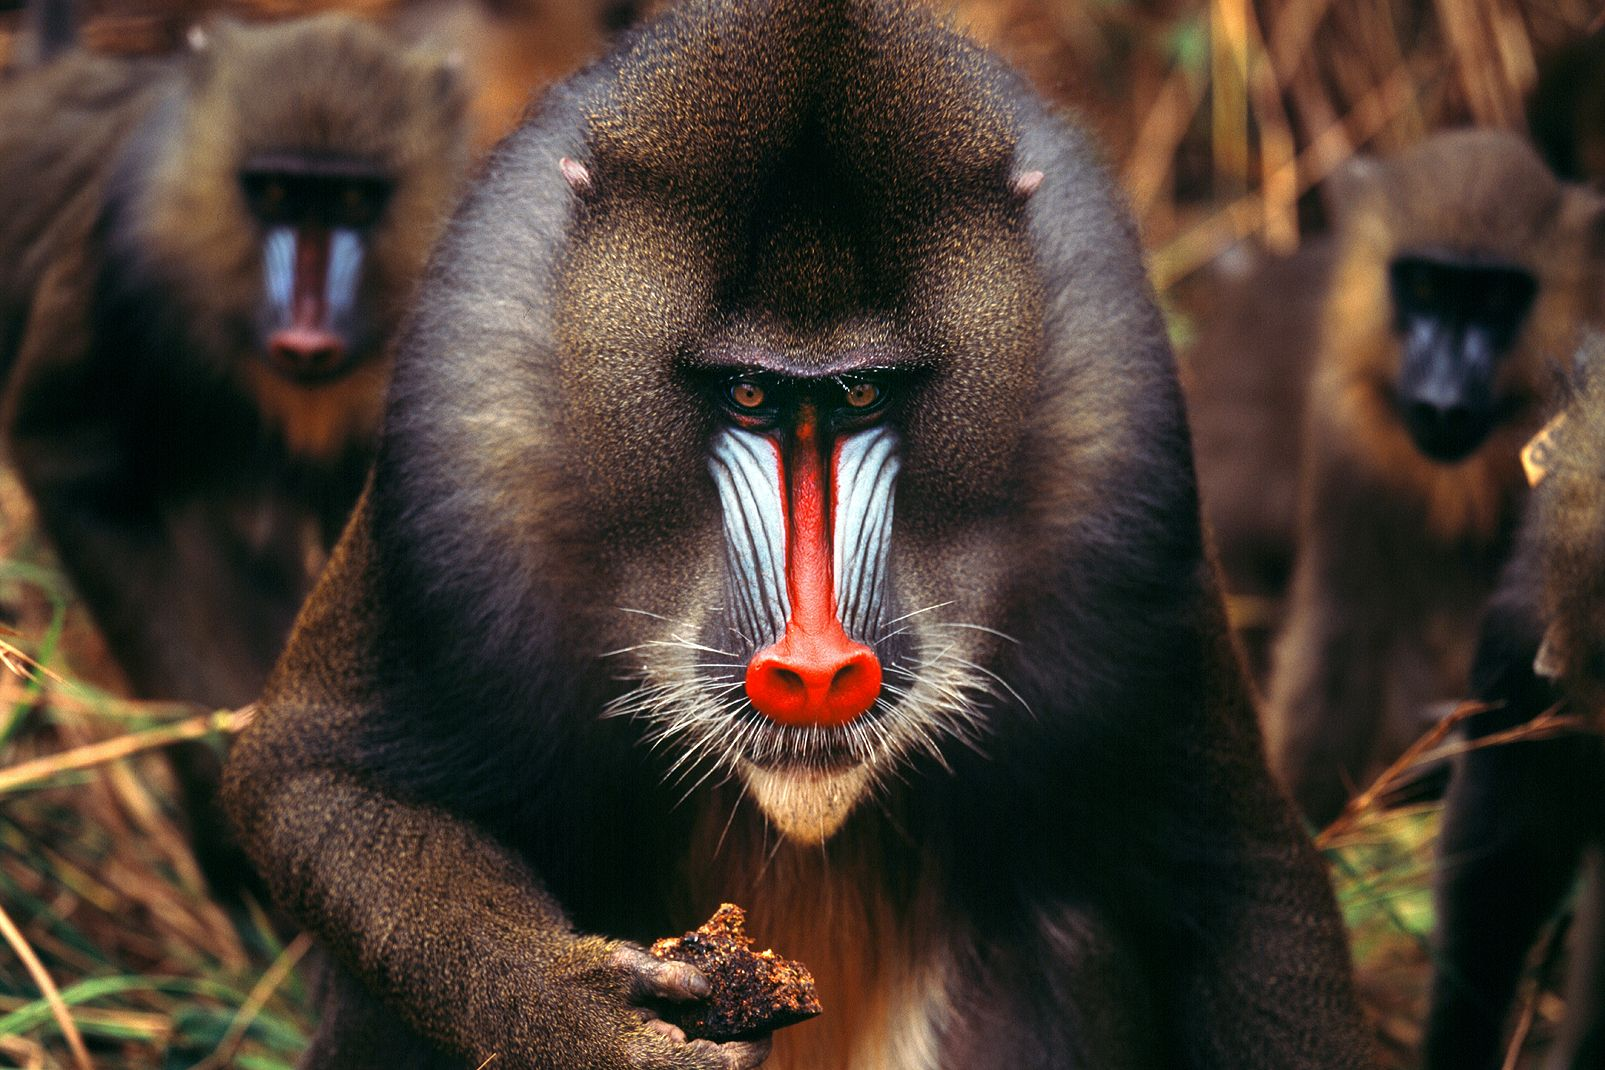 Afrique, gabon, animal, faune, primate, singe, mammifère, mandrill; mammifère